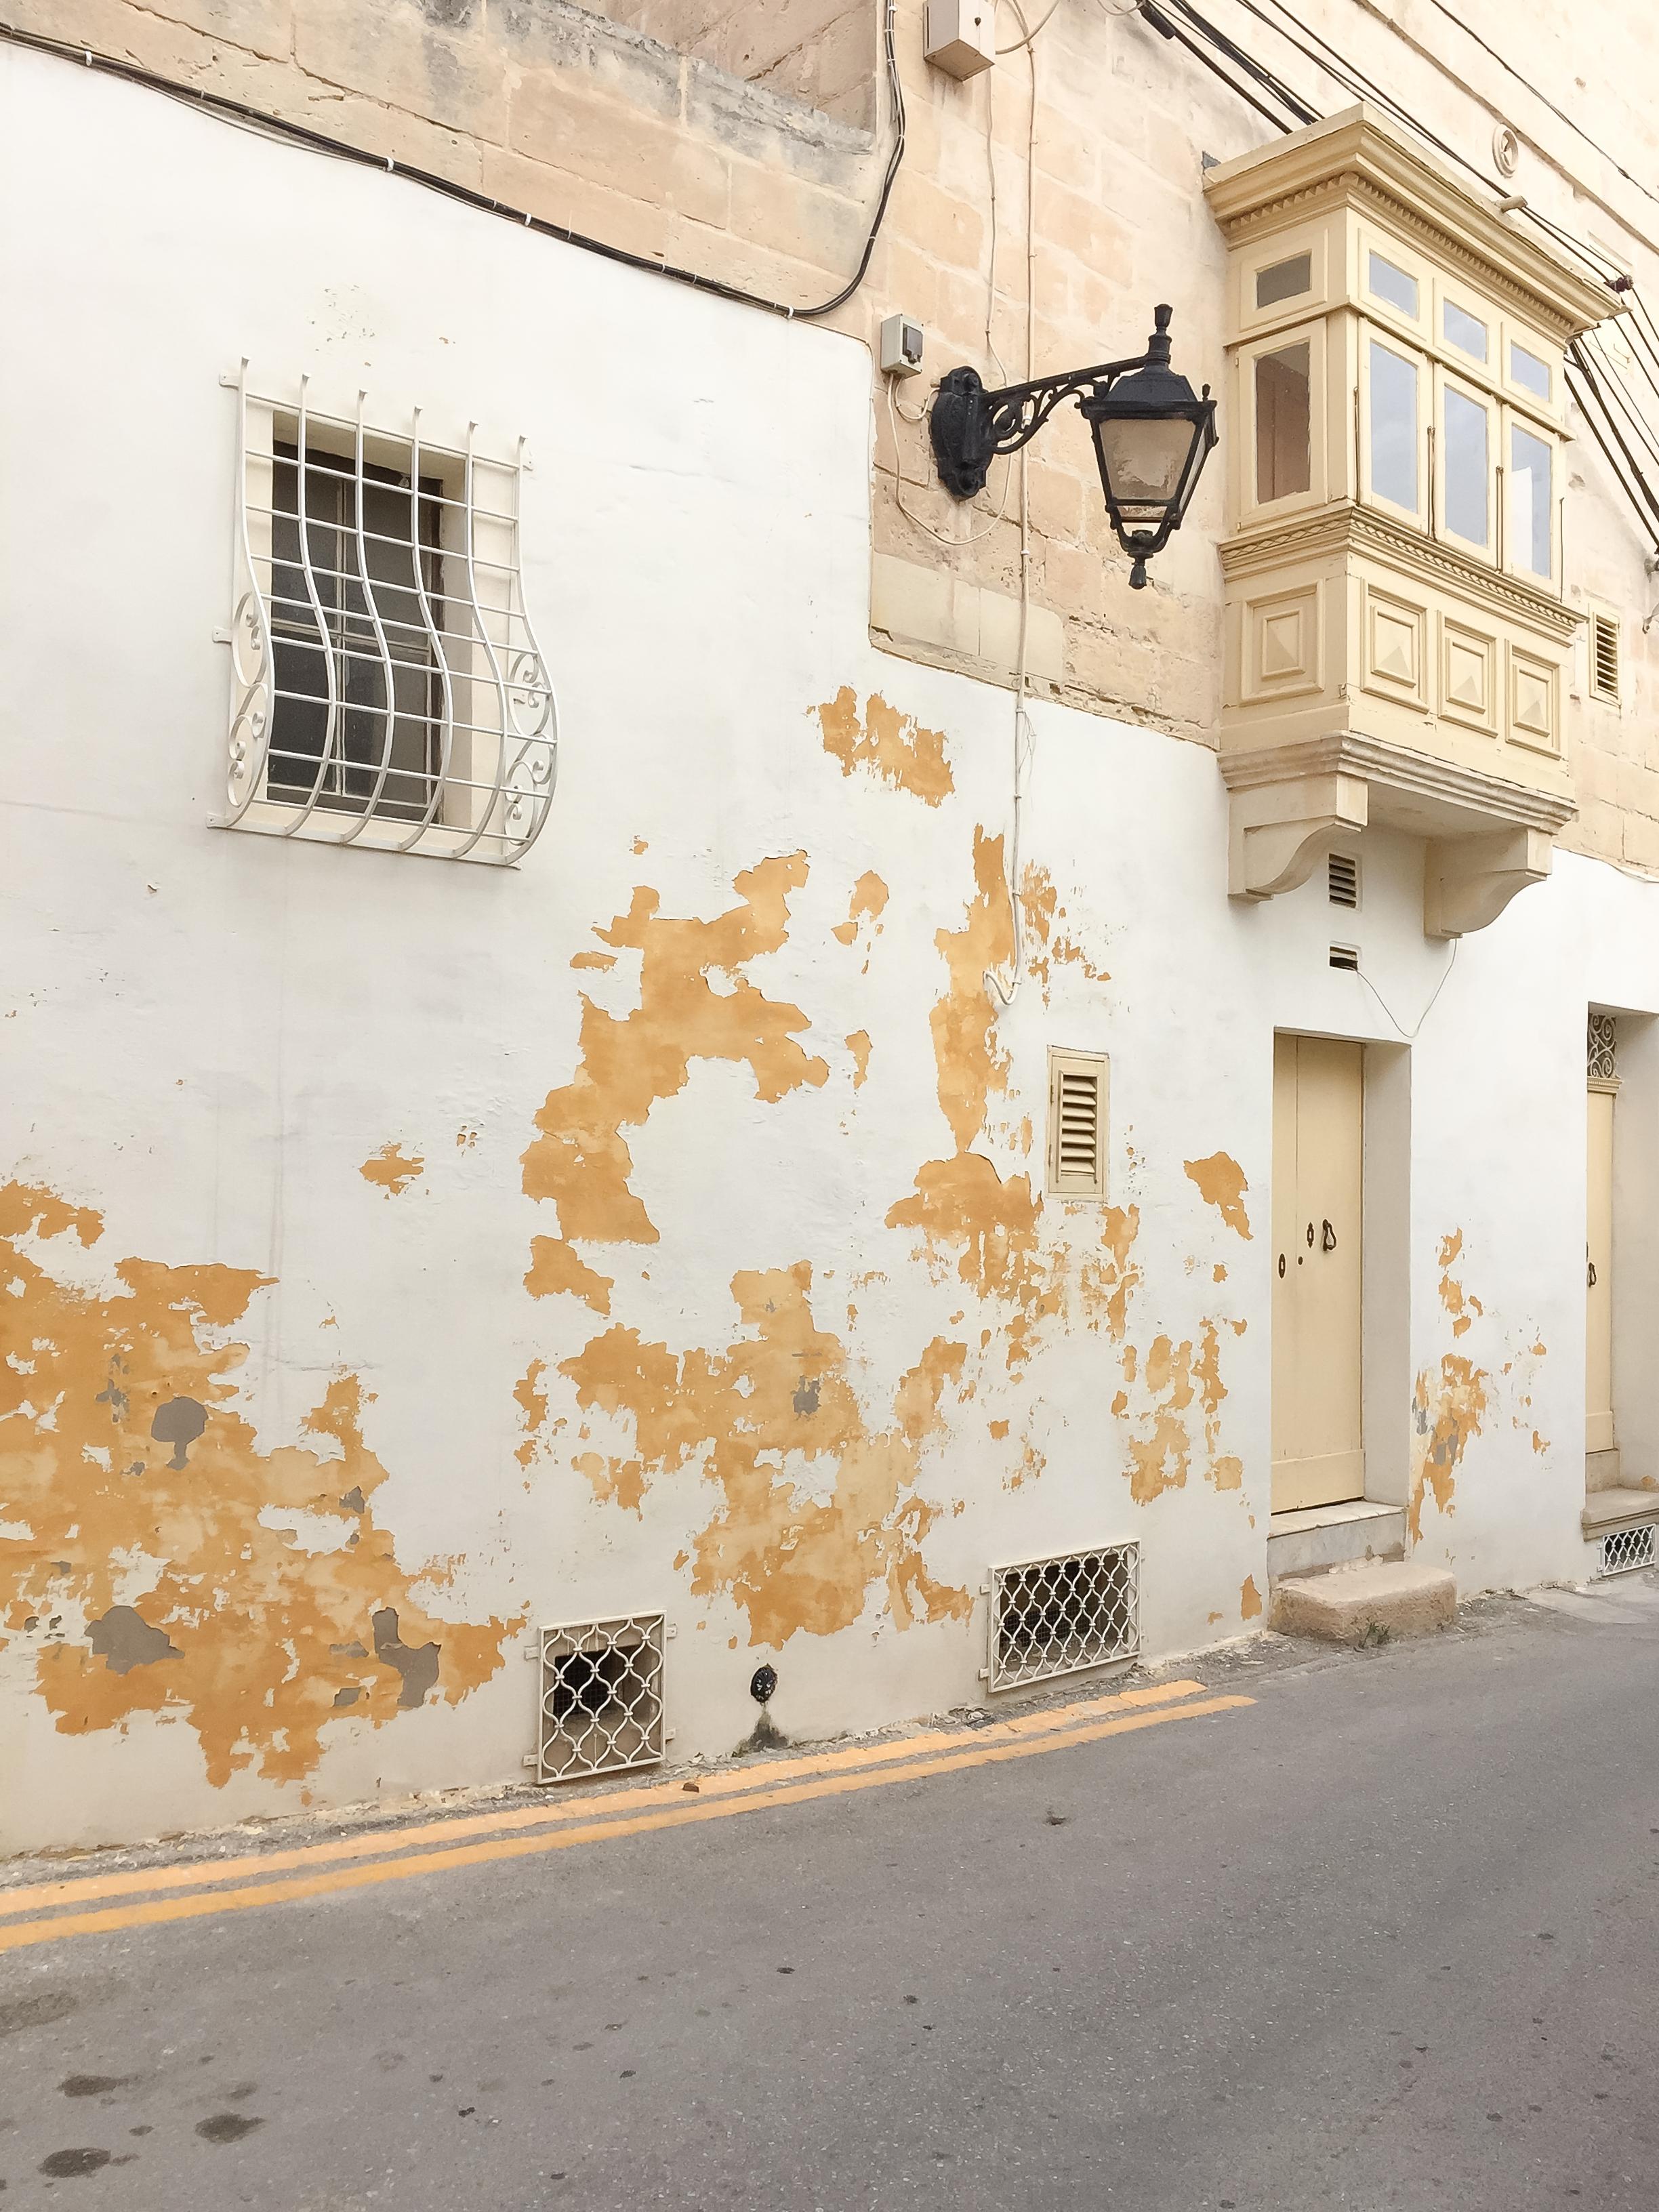 Street of Malta   MĦal Għargħur   - Thinking About Appreciation For Quality In Malta   Malta, Europe   DoLessGetMoreDone.com   - Minimal Travel Documentary Photography - search for Liveability   Sustainability